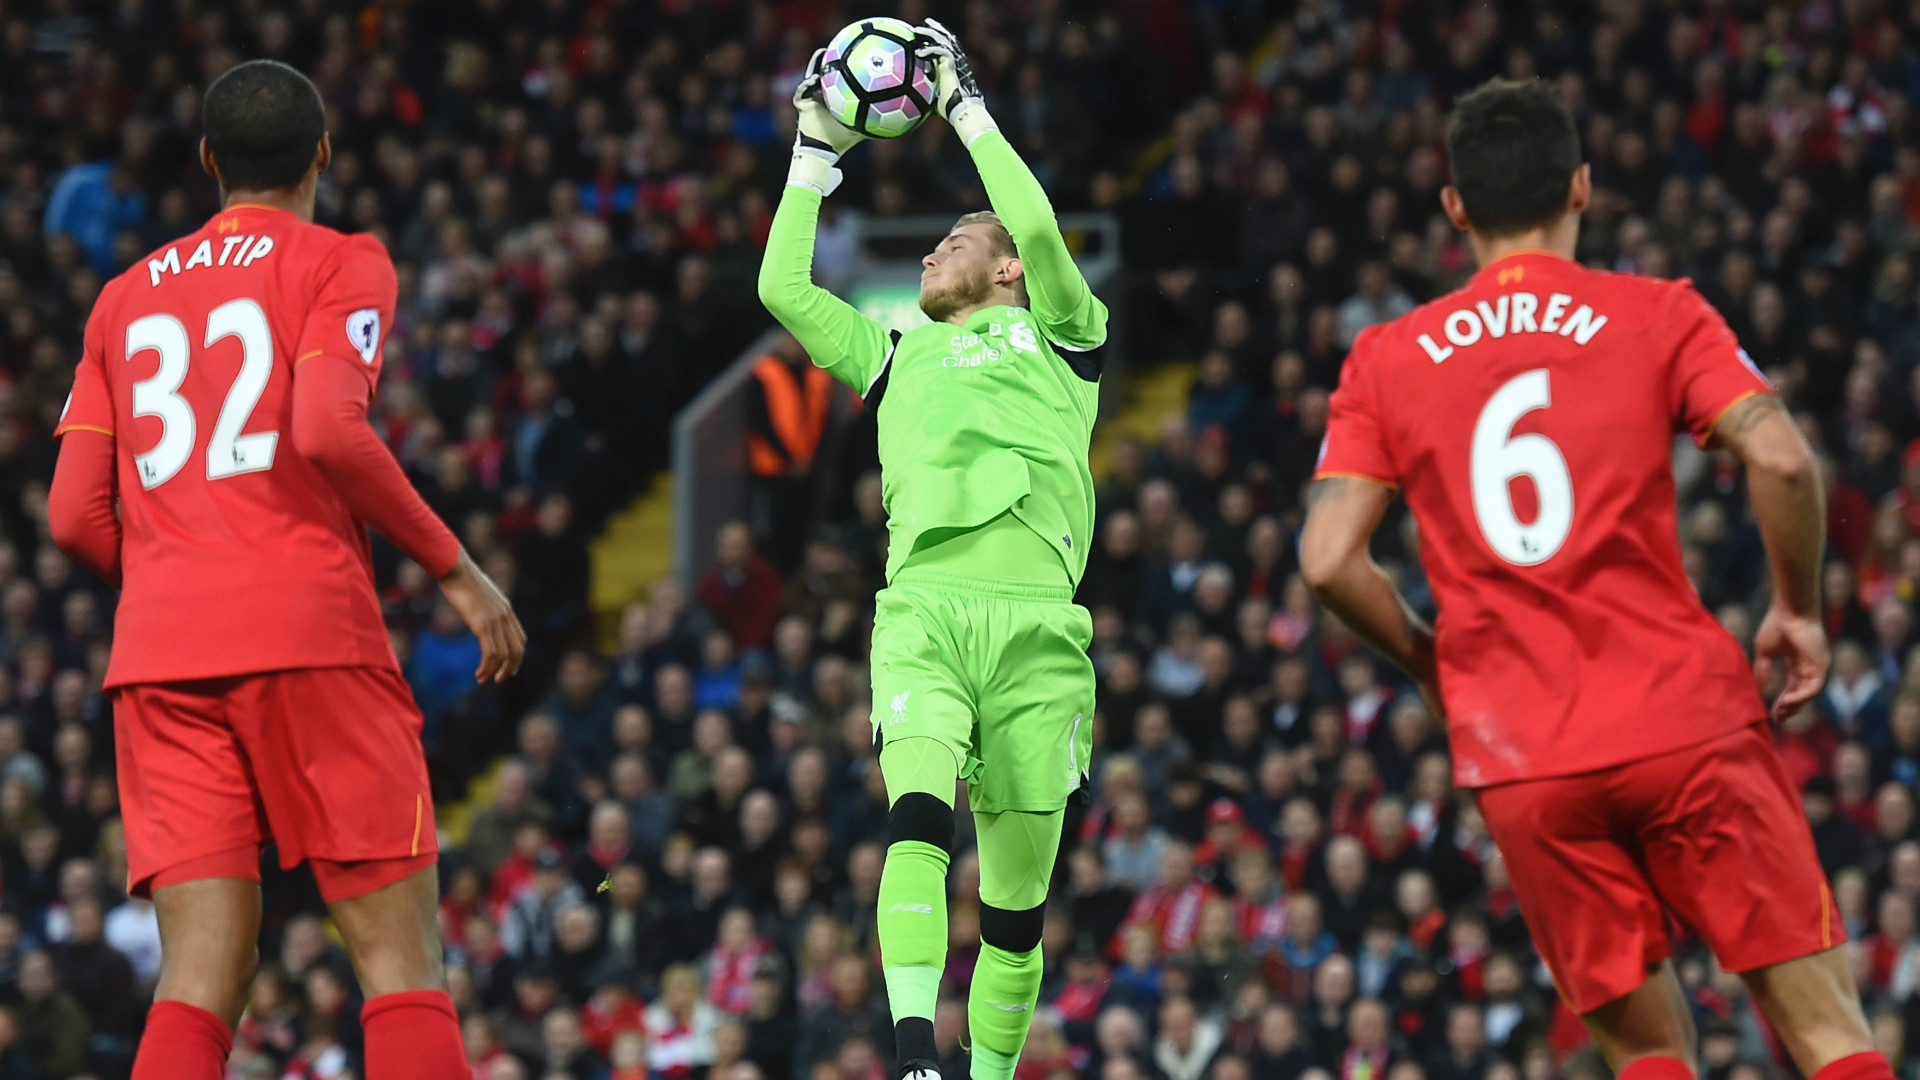 HD Liverpool Karius Lovren Matip